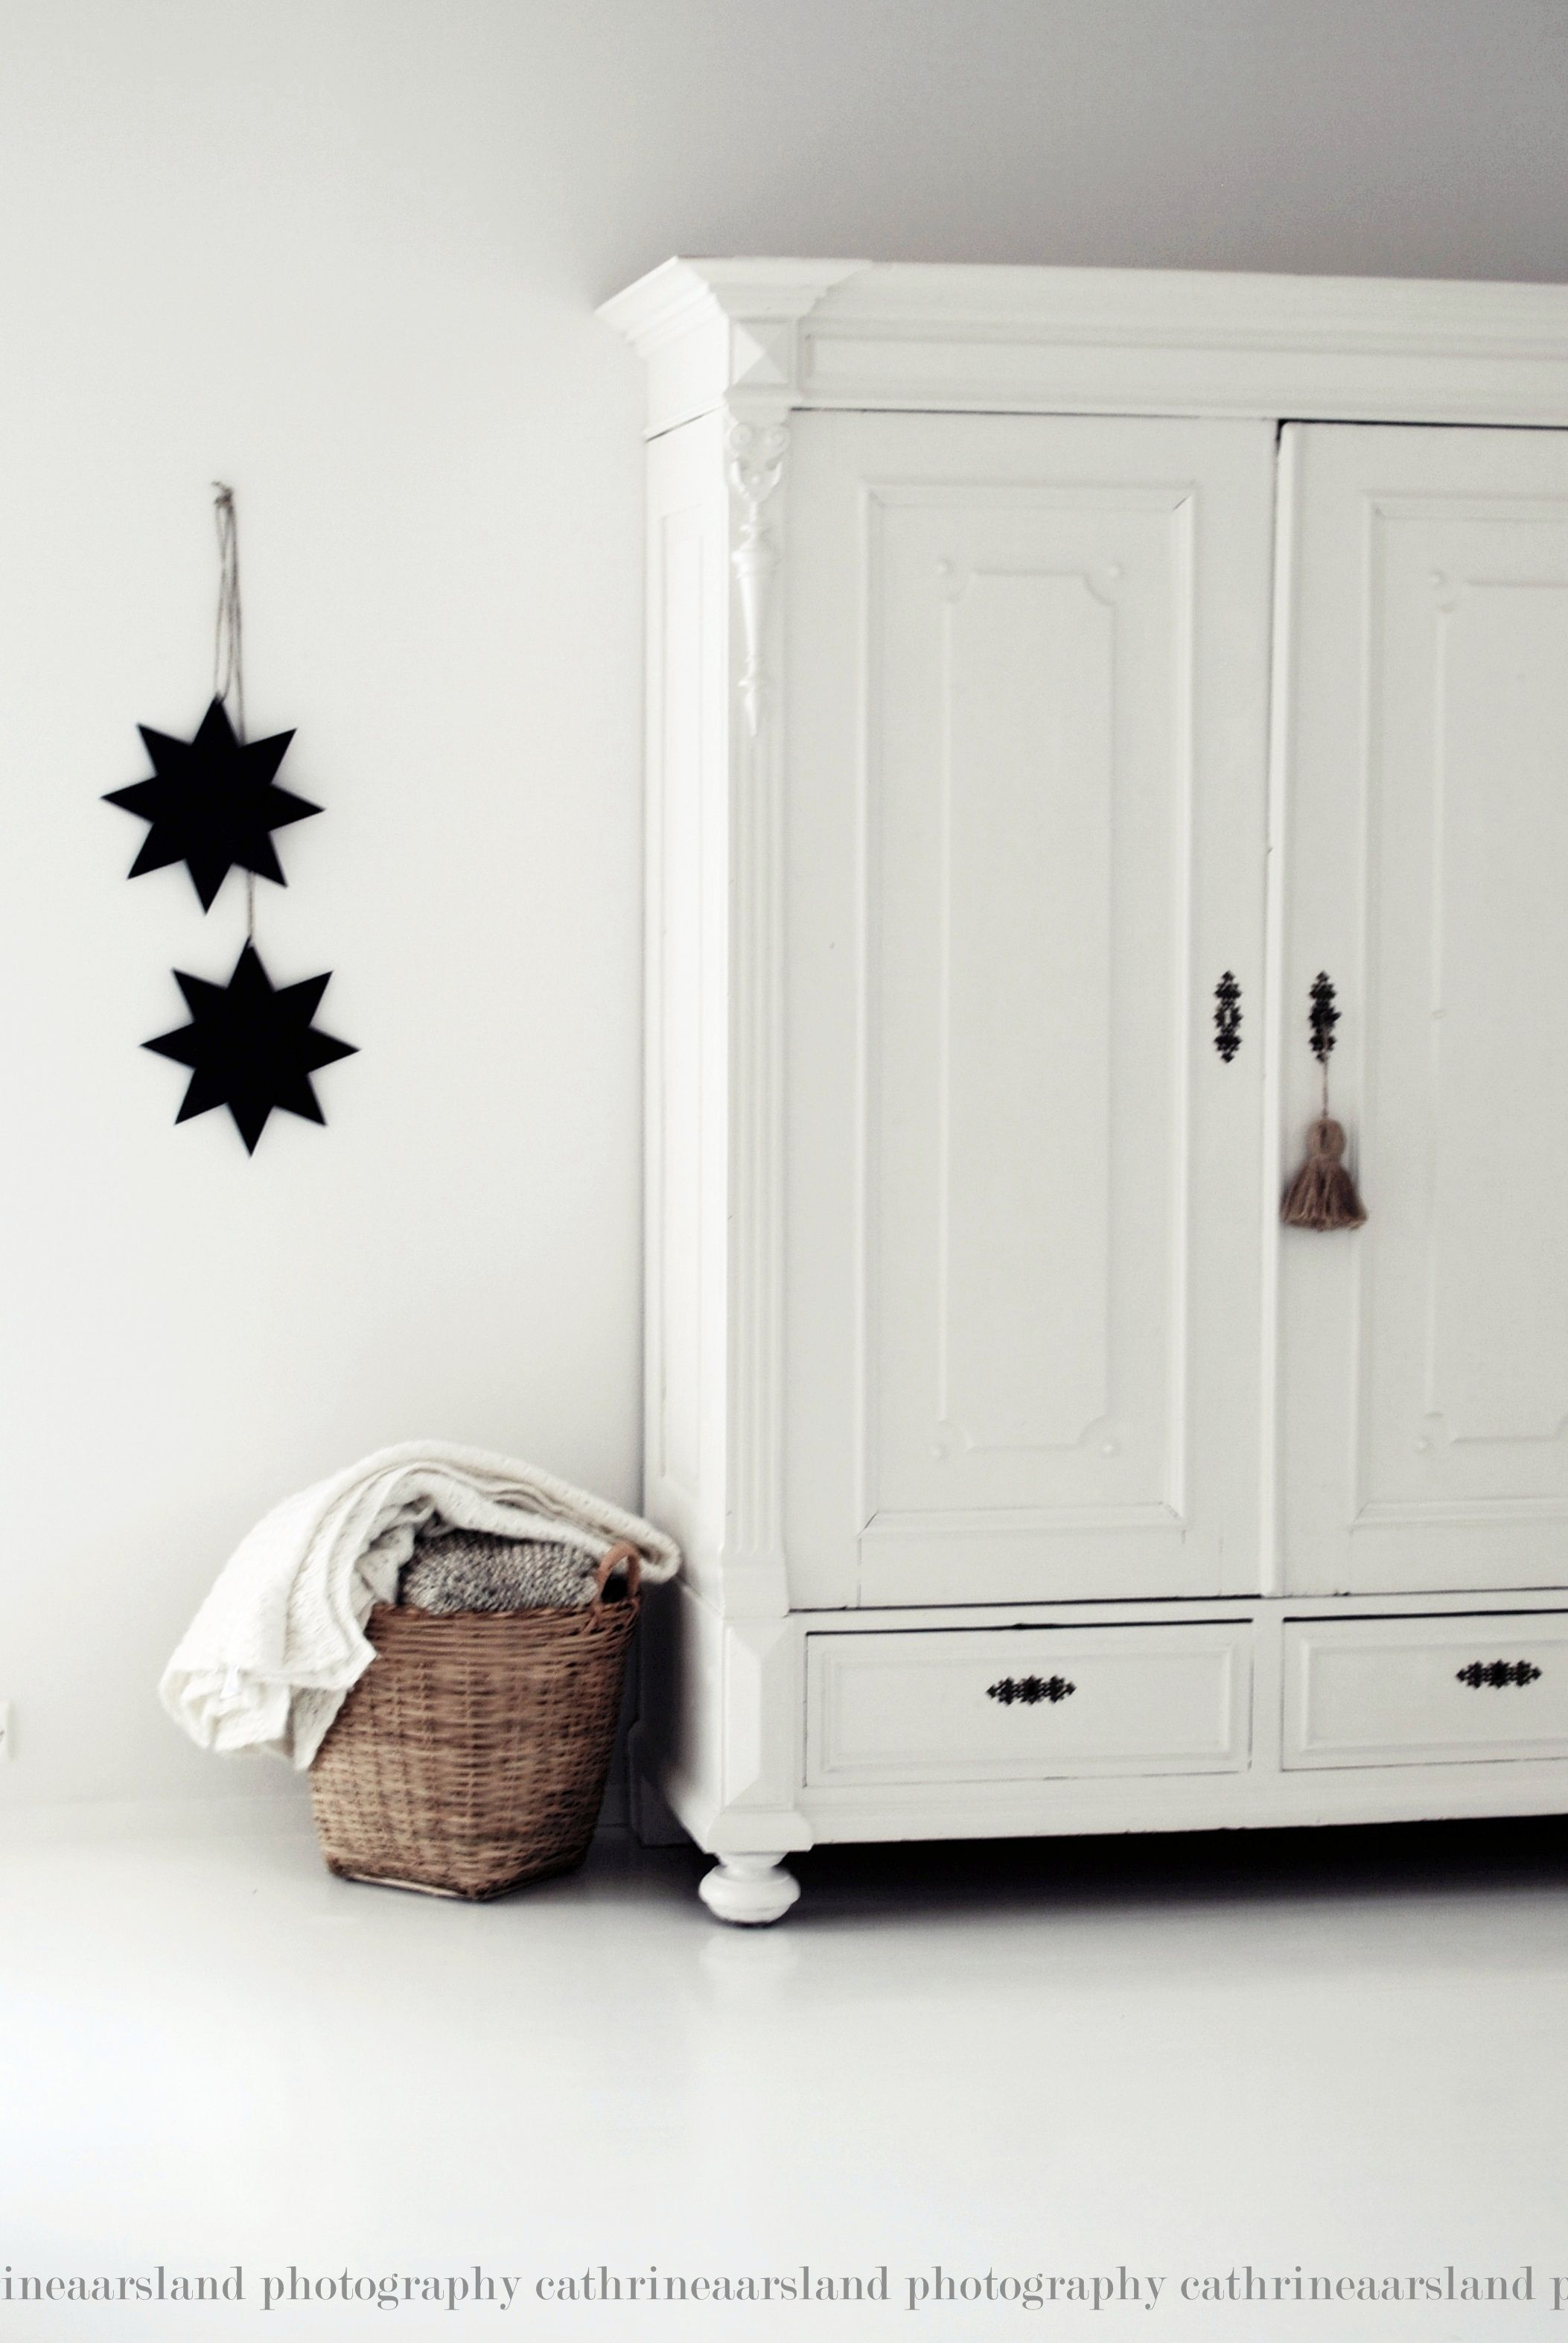 Nordic Bliss Scandinavian Style For Your Home Haus Deko Coole Mobel Zuhause Dekoration